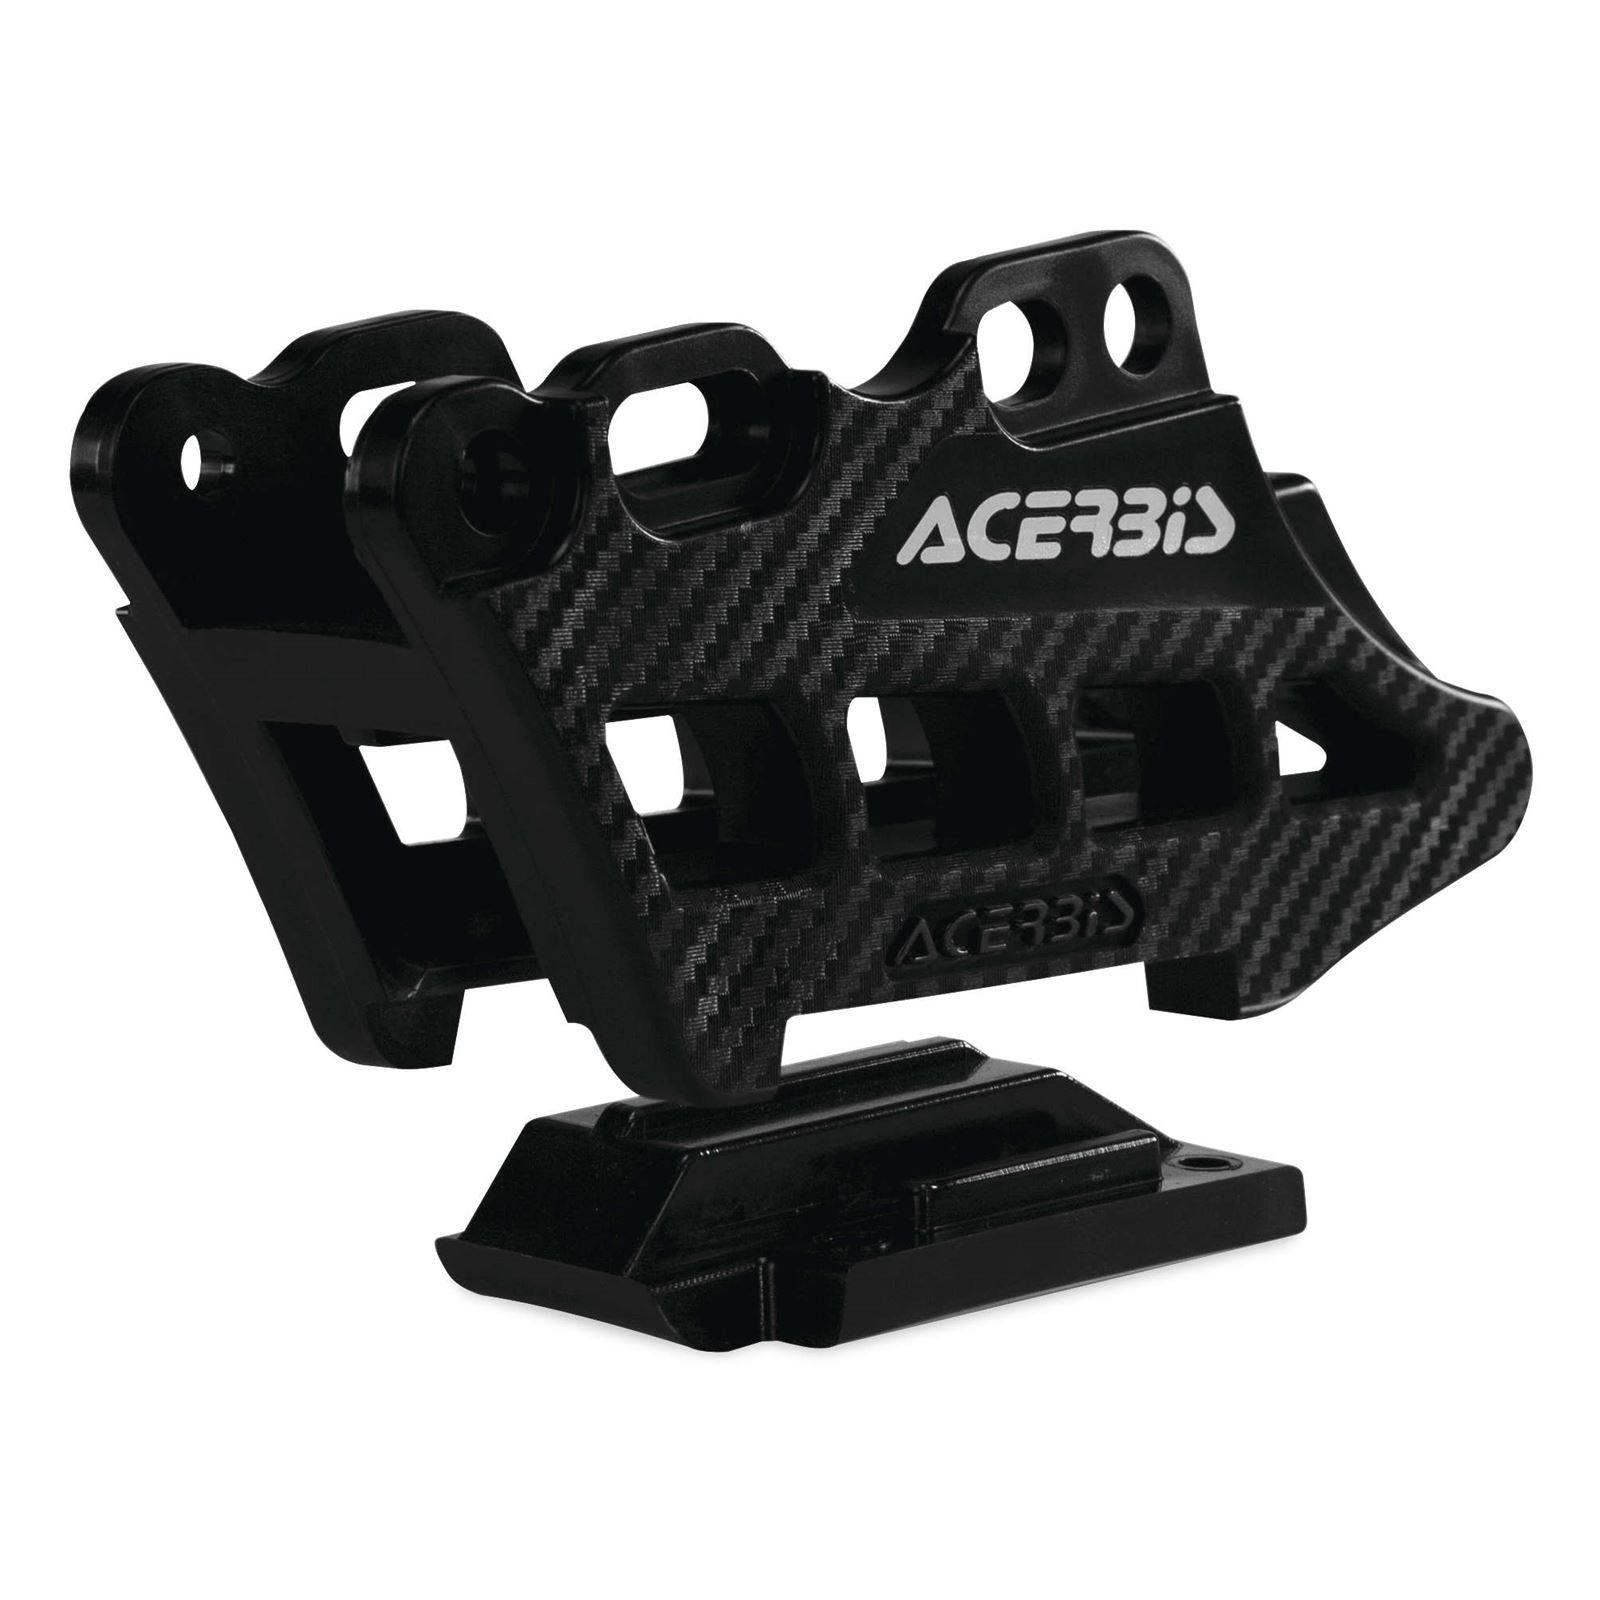 Acerbis Chain Guide Block 2.0